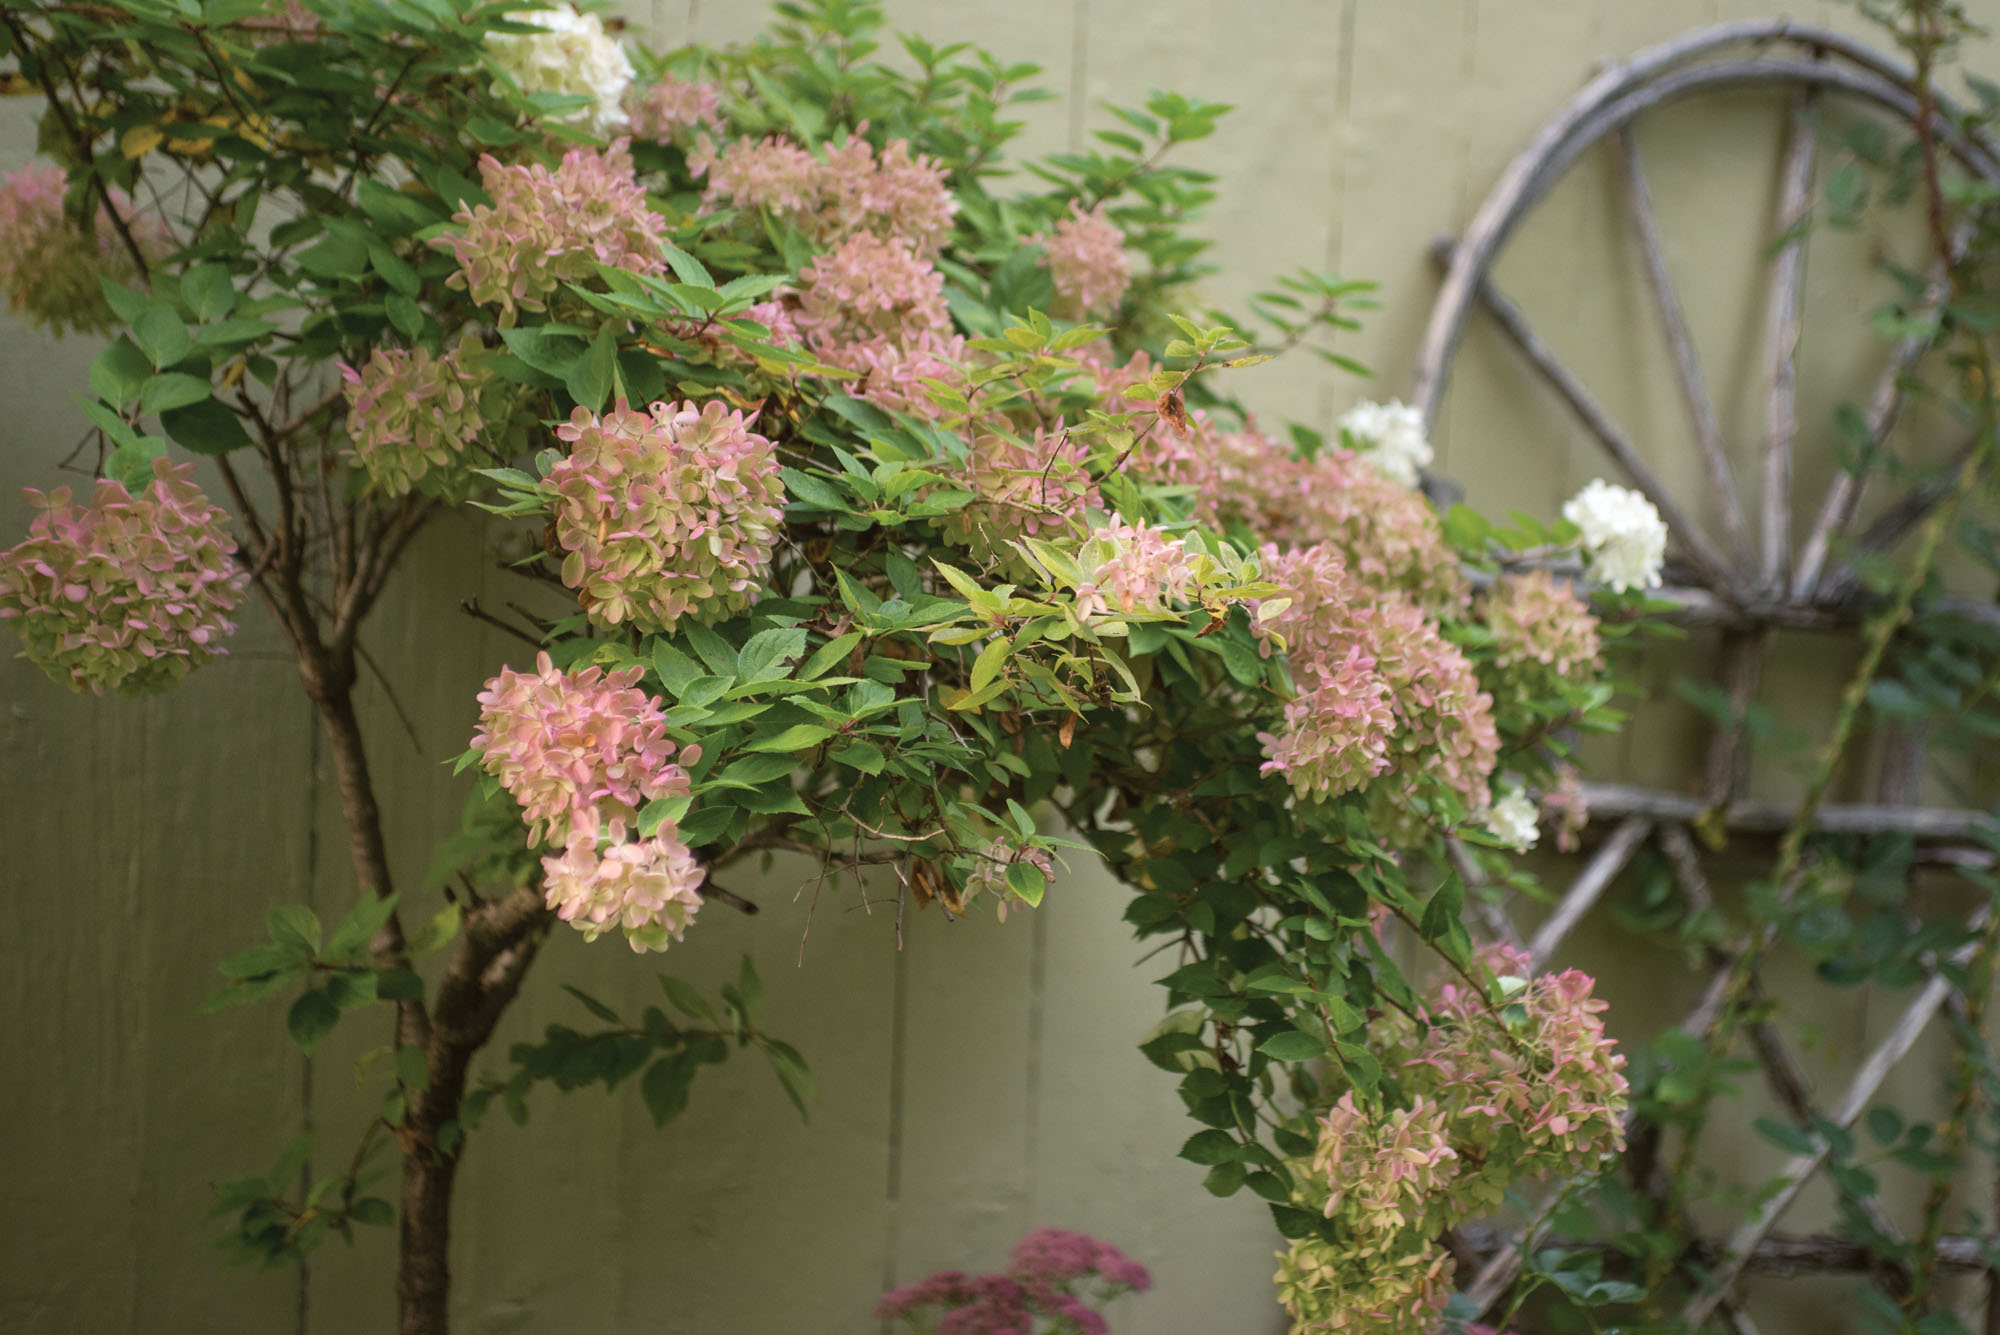 Tovah Martin's Autumn Garden at Furthermore